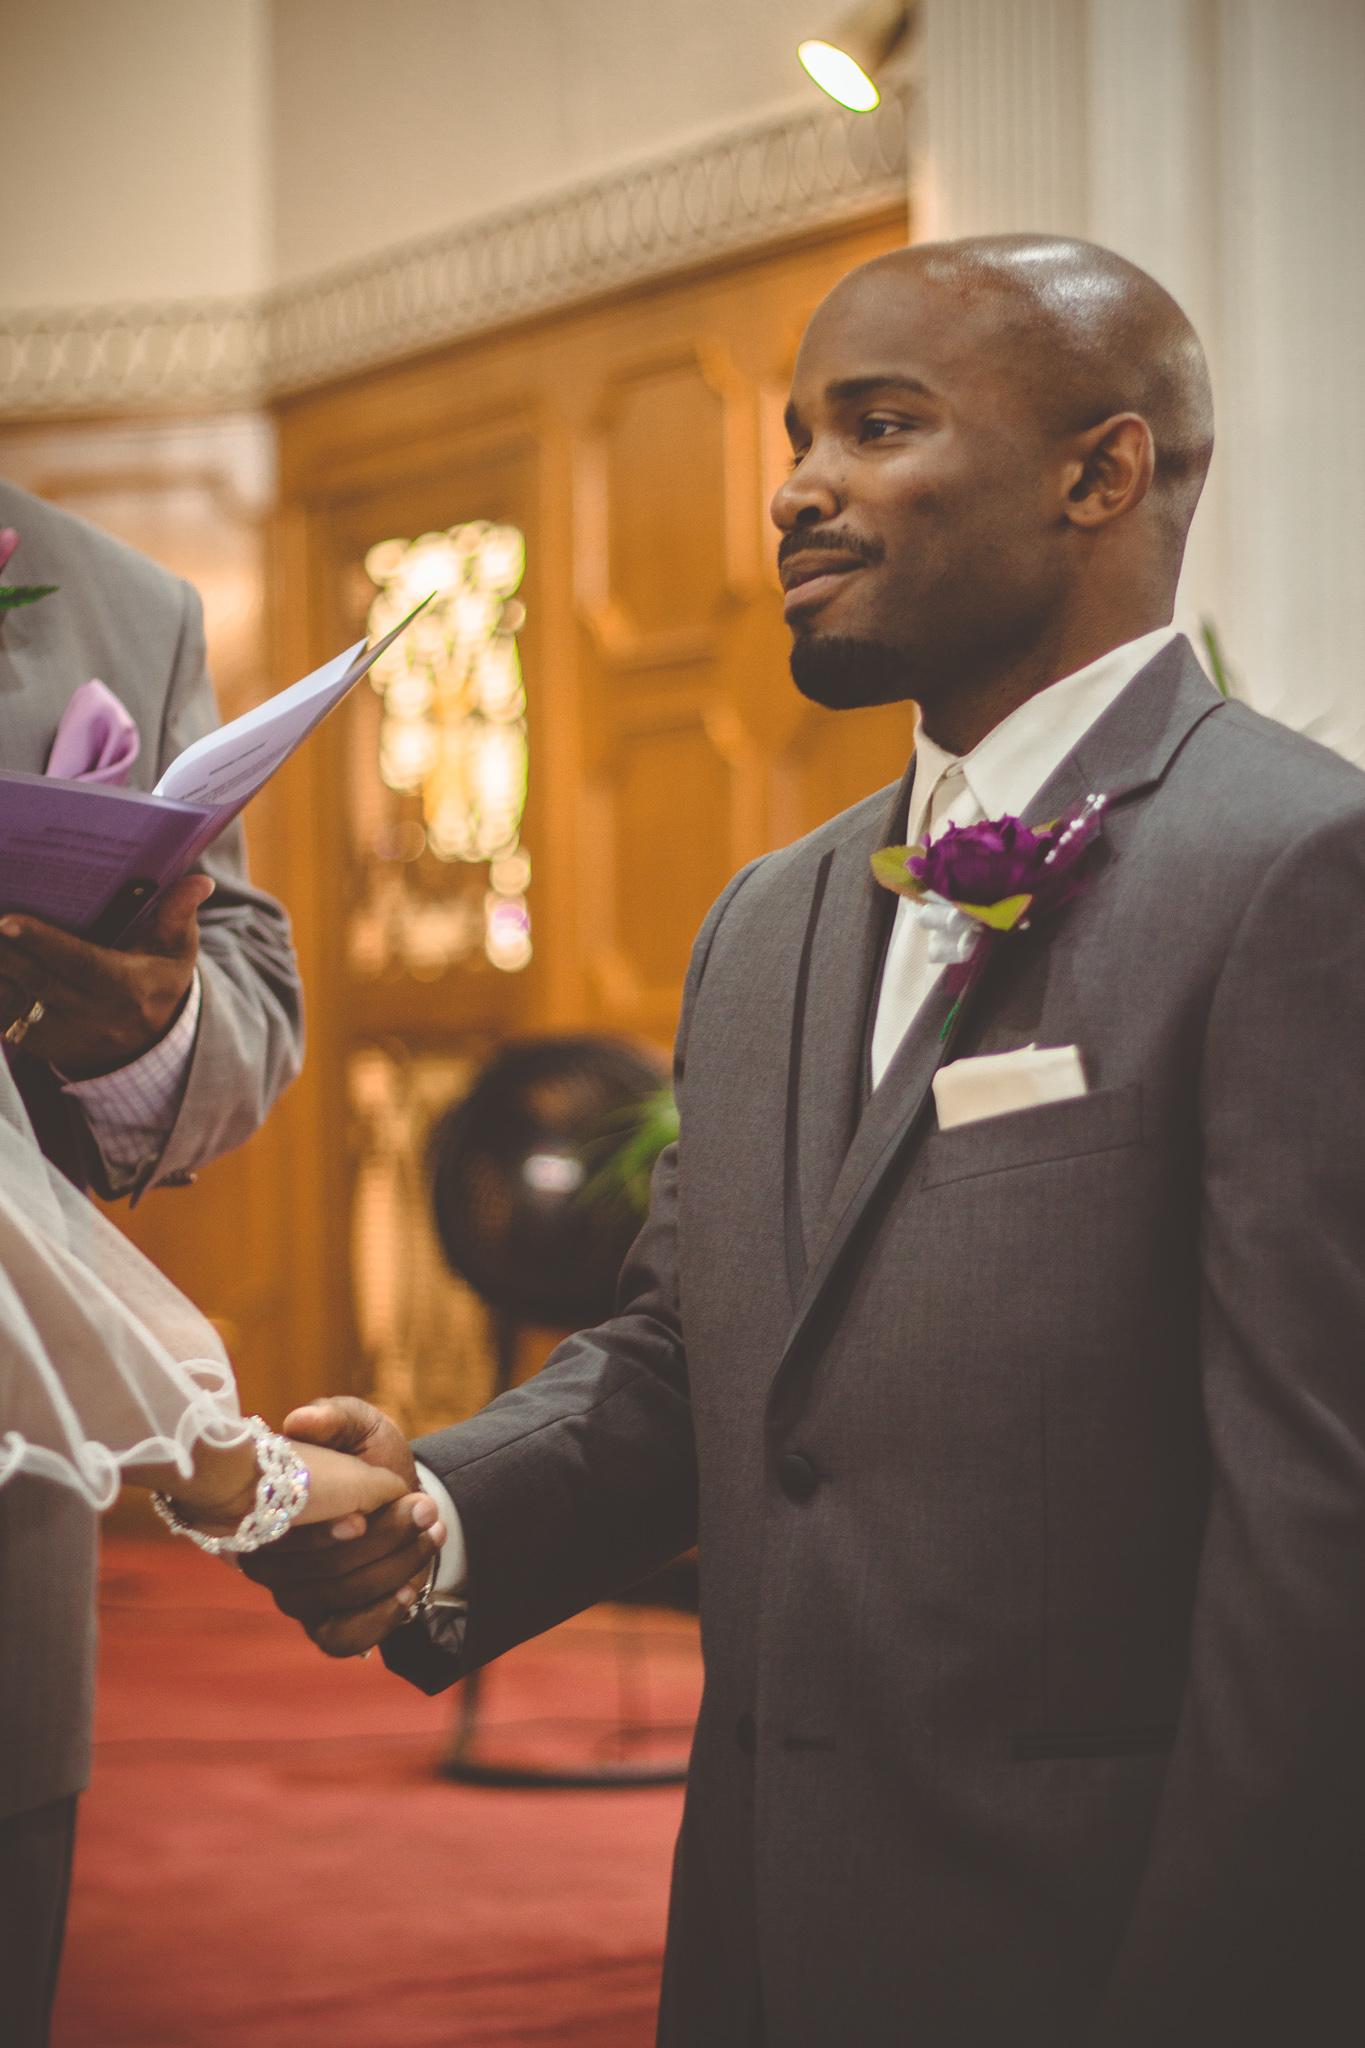 Johnson Wedding-158.jpg